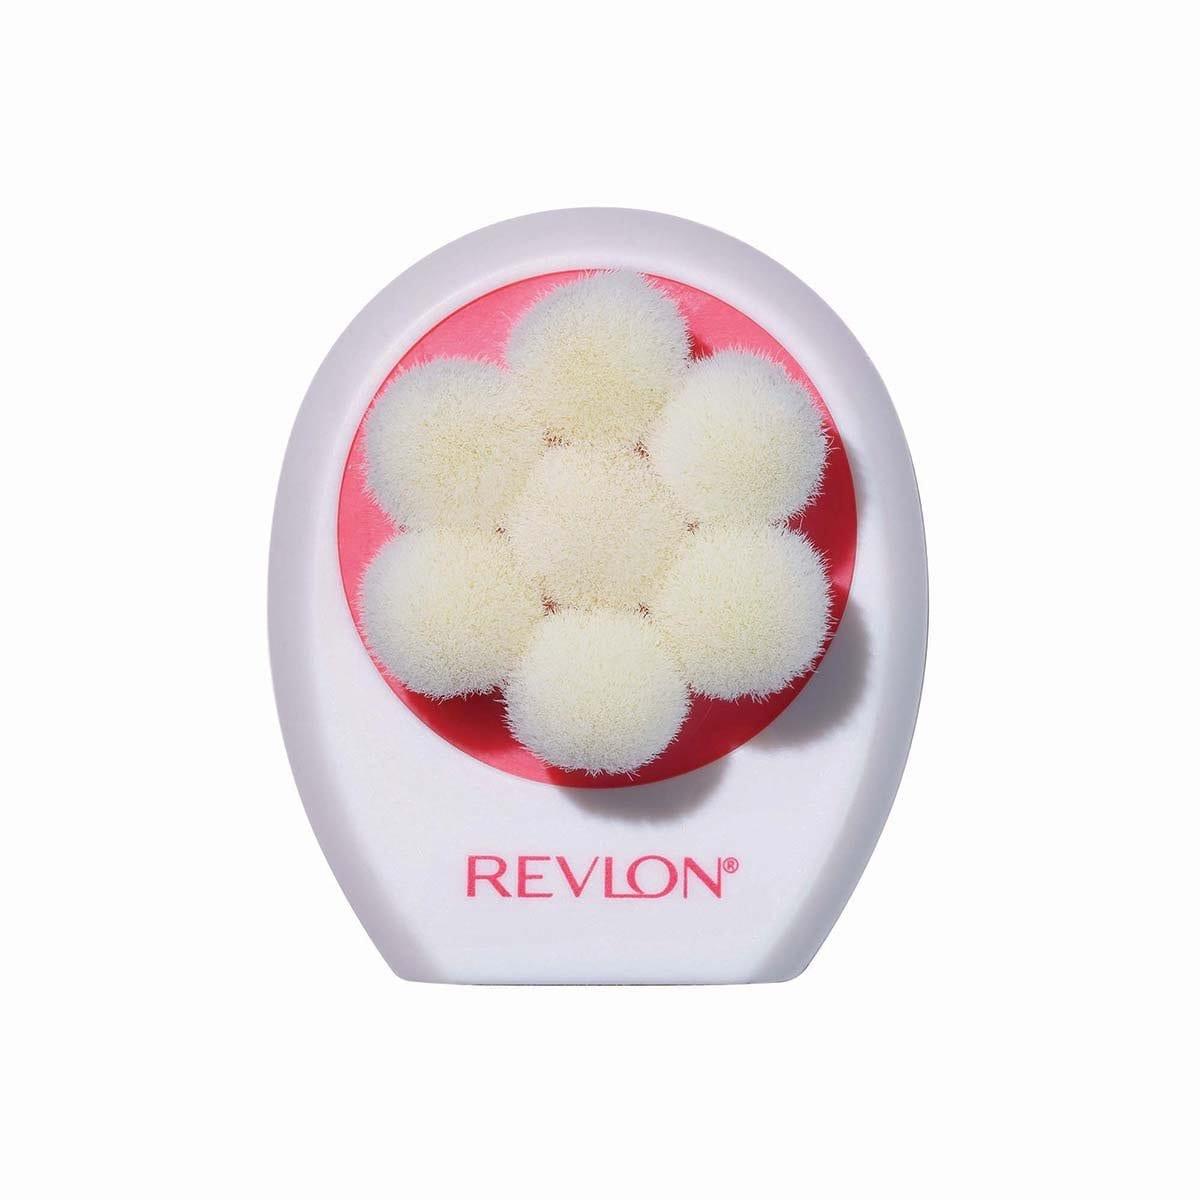 Cepillo Exfoliante Cerdas Extrafinas Revlon